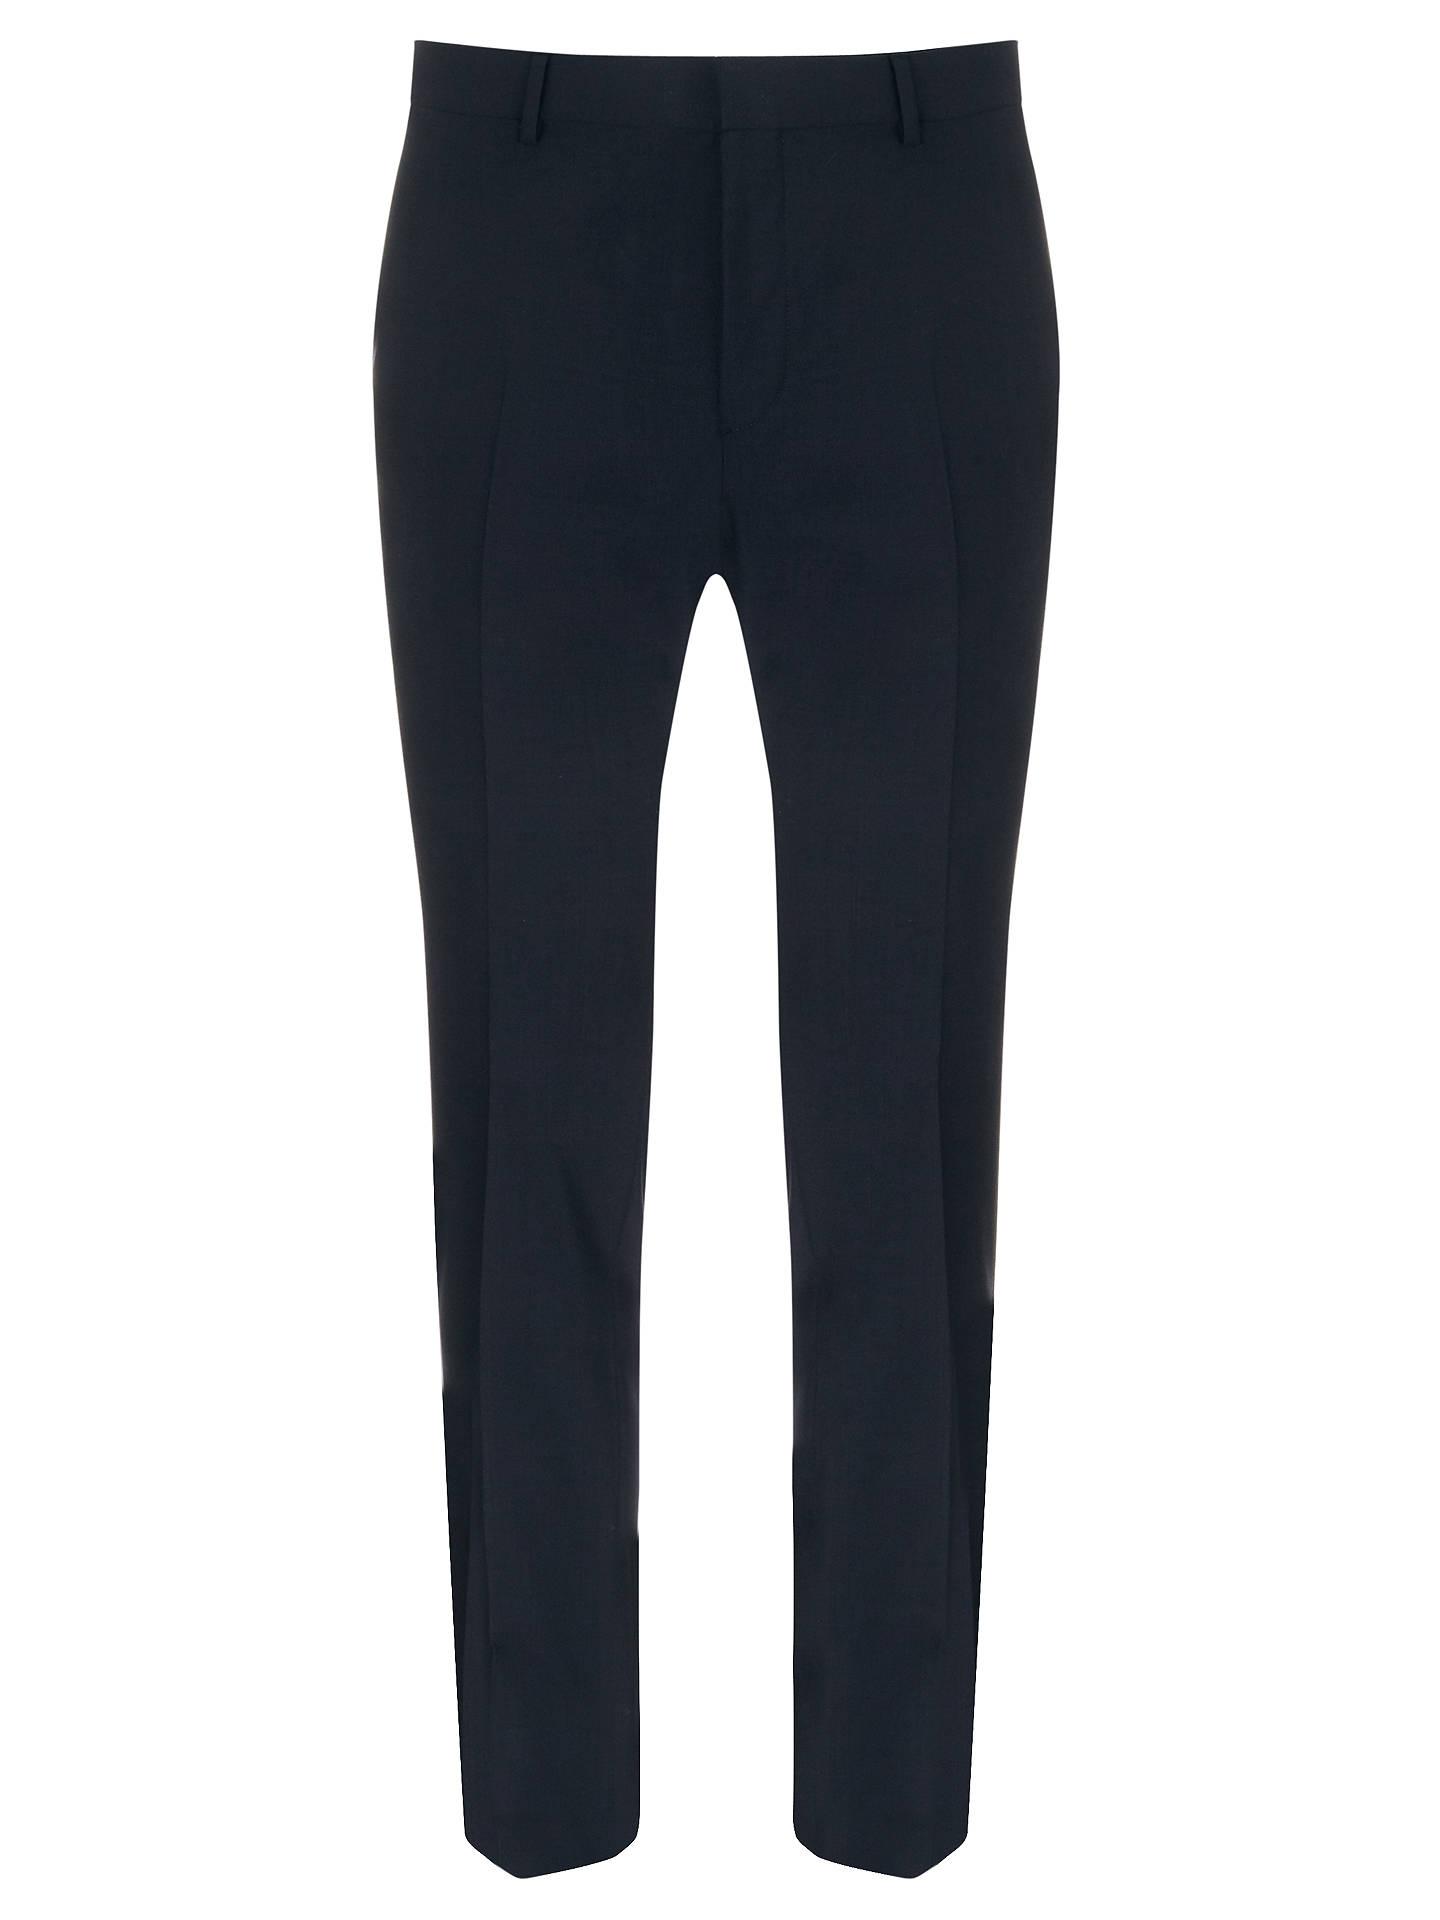 8ac0494bac6 BuyCalvin Klein Plain Weave Wool Suit Trousers